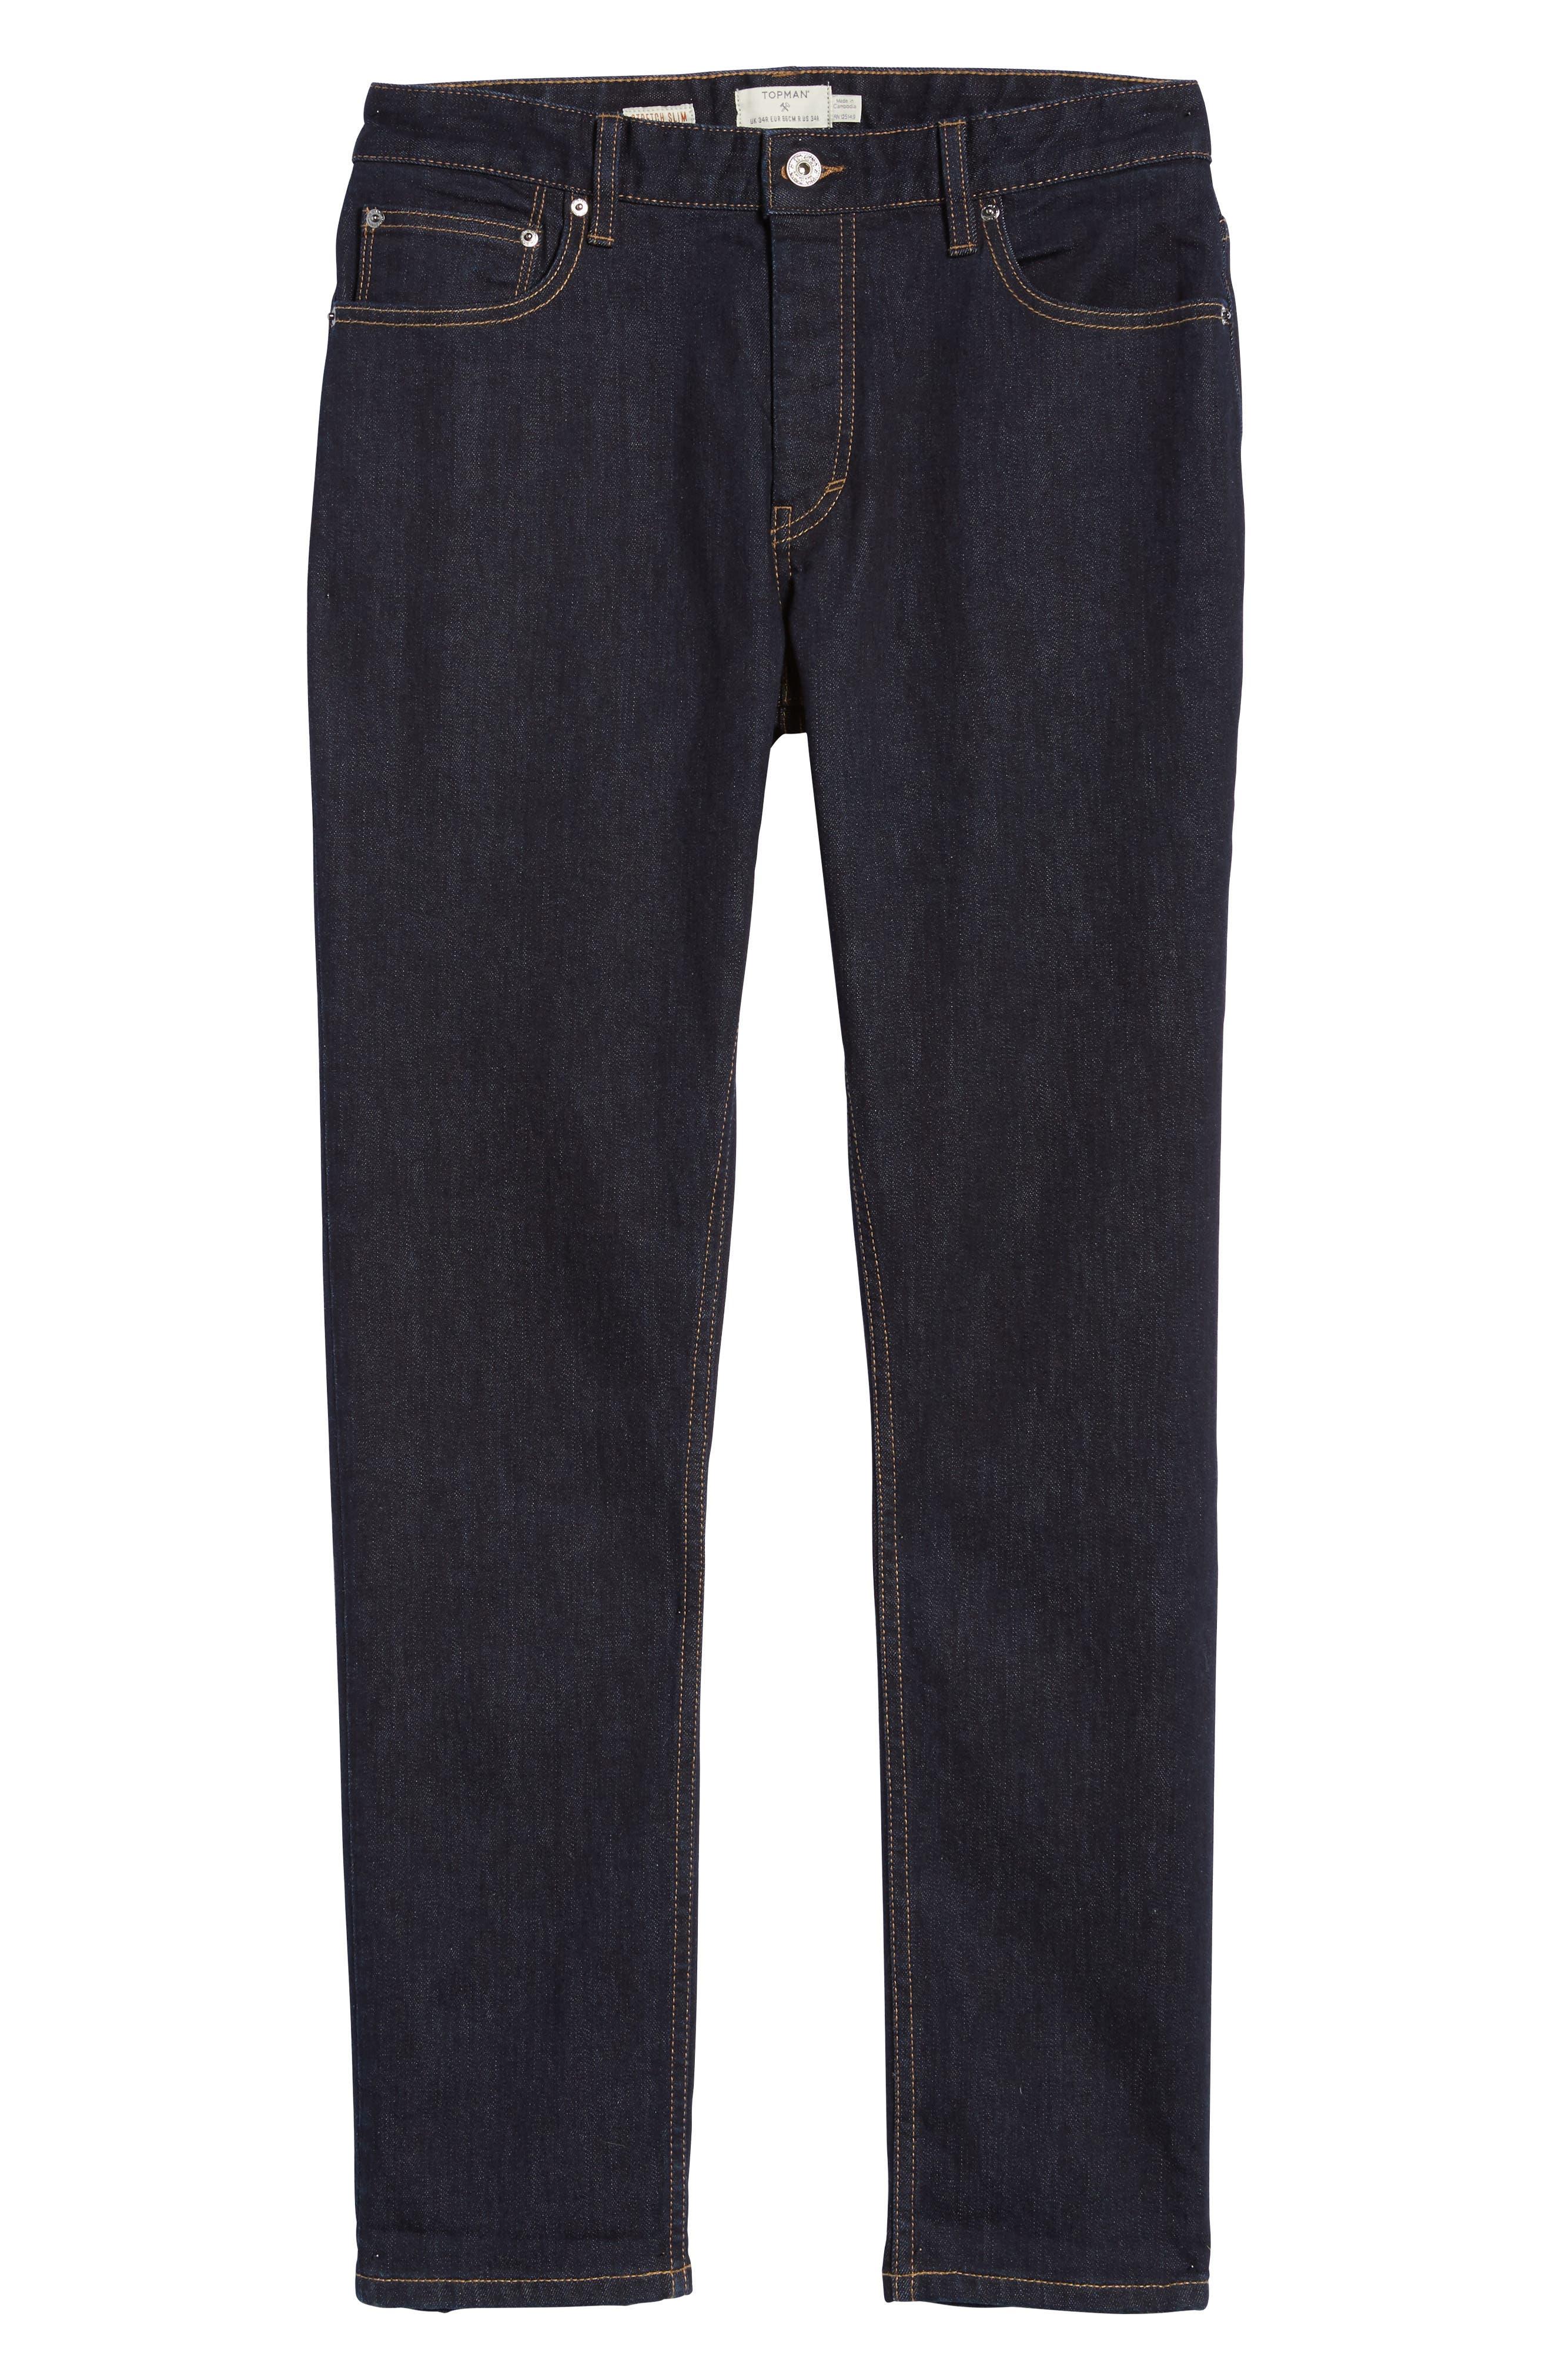 Stretch Slim Fit Raw Denim Jeans,                             Alternate thumbnail 6, color,                             400